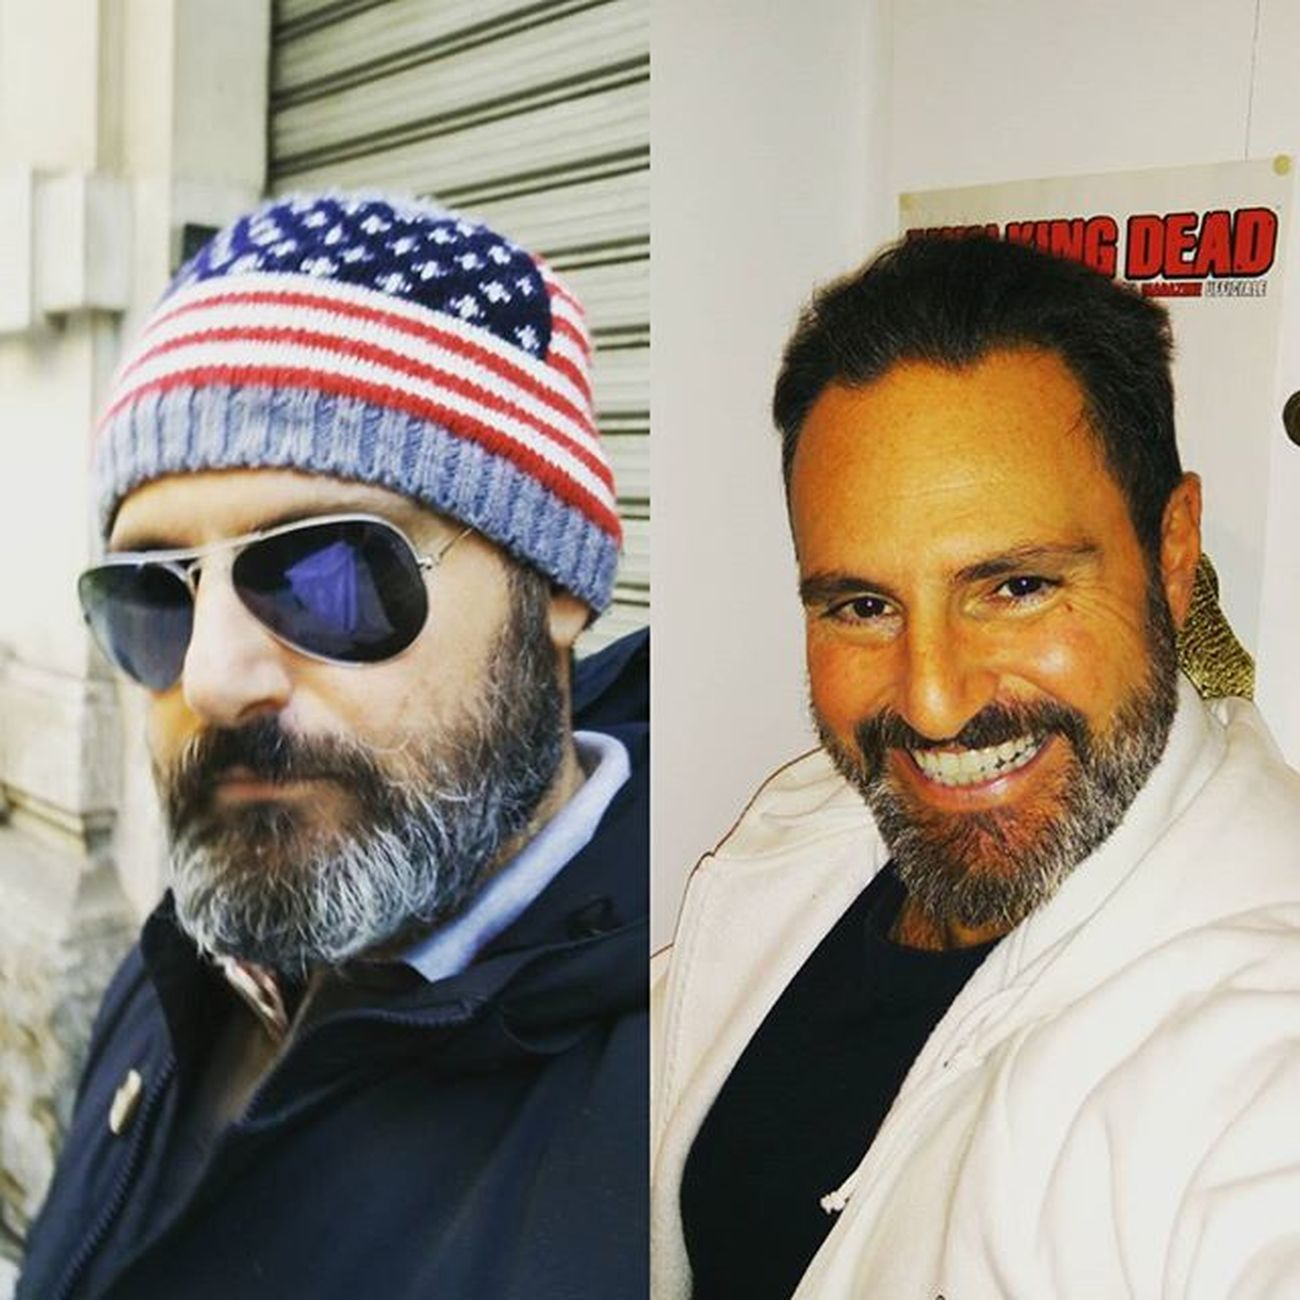 Aftershave Beard Webseries Movieface Moviescene Iwasborntobeandactor Healthychoices Illgiveaarmforahamburger Ineedtolooseweight Dieta Dimagriremangiando Seriestv Paolograssi Alchermesvideoproduction